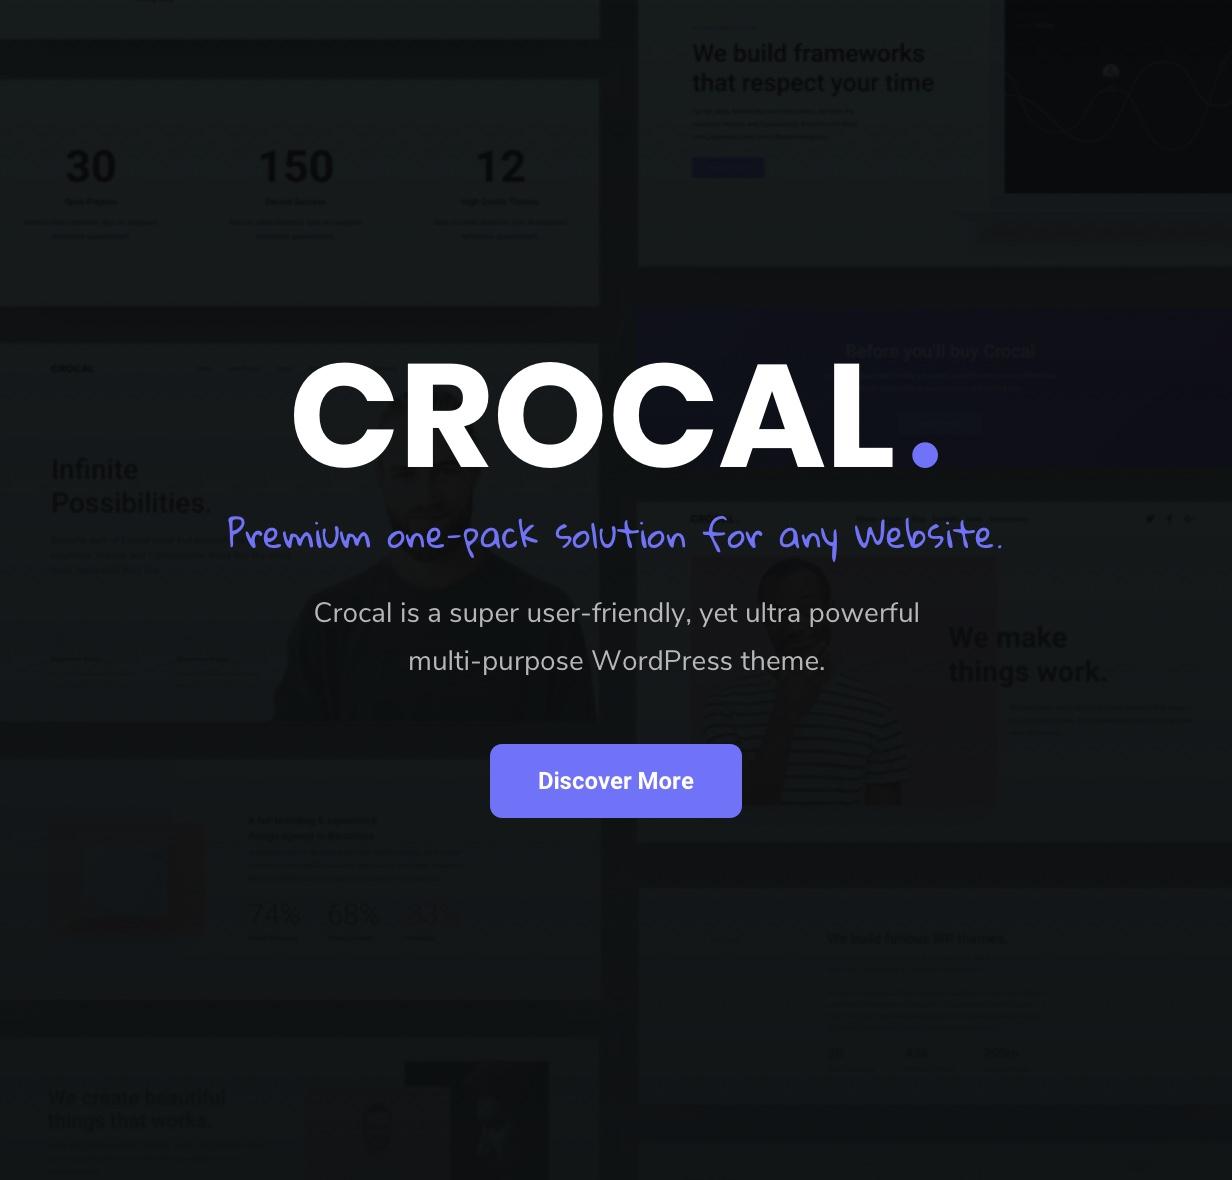 Crocal Intro